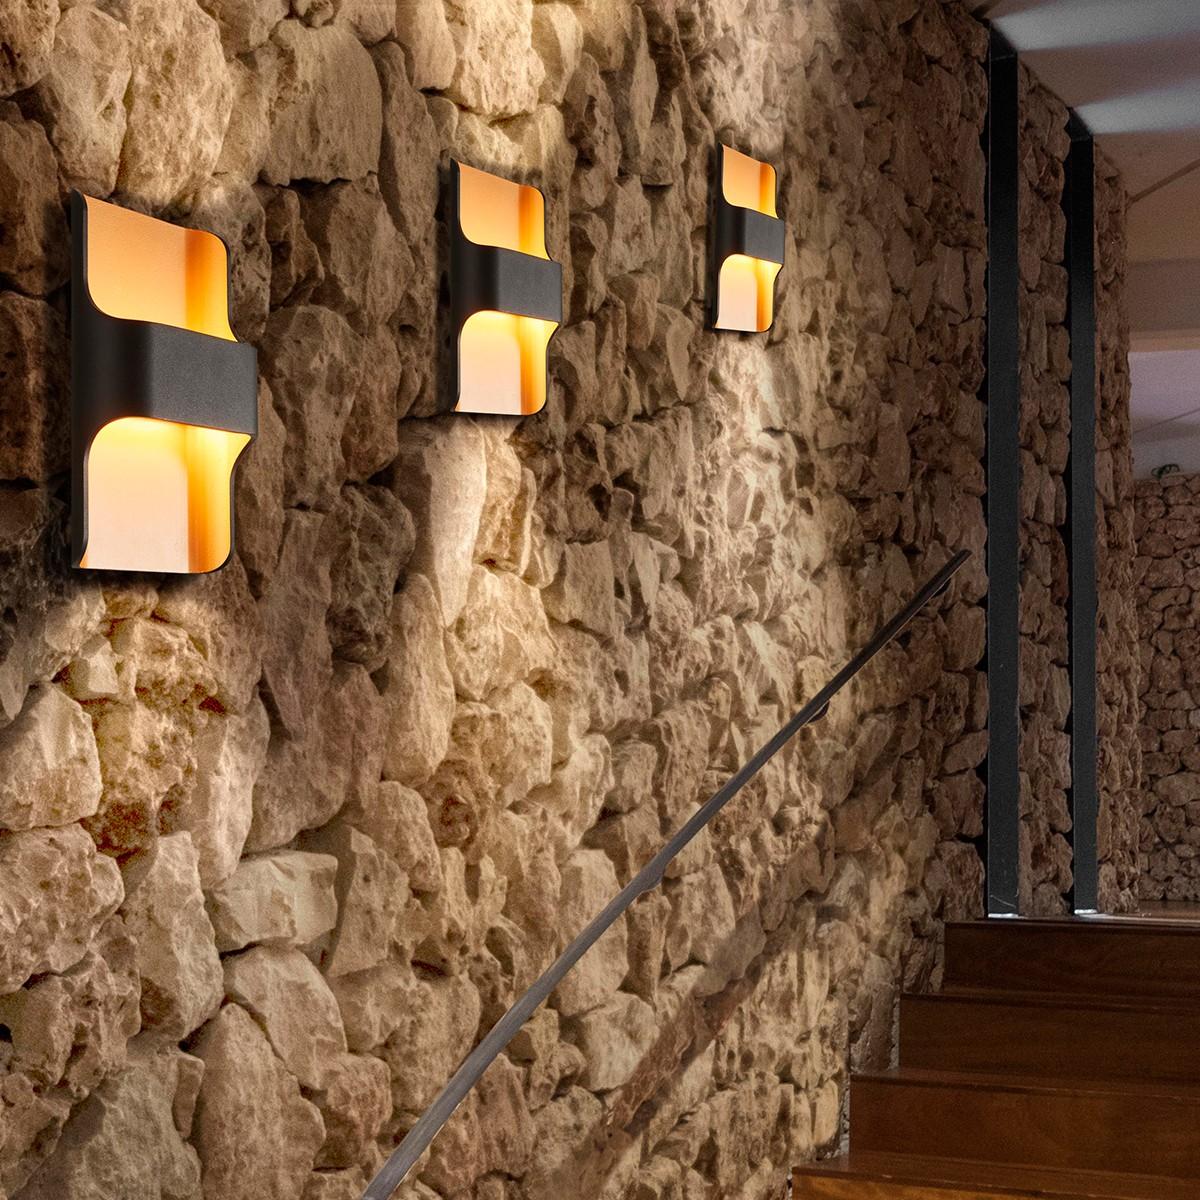 mylight dortmund wandleuchte schwarz gold fahrschulen heins. Black Bedroom Furniture Sets. Home Design Ideas